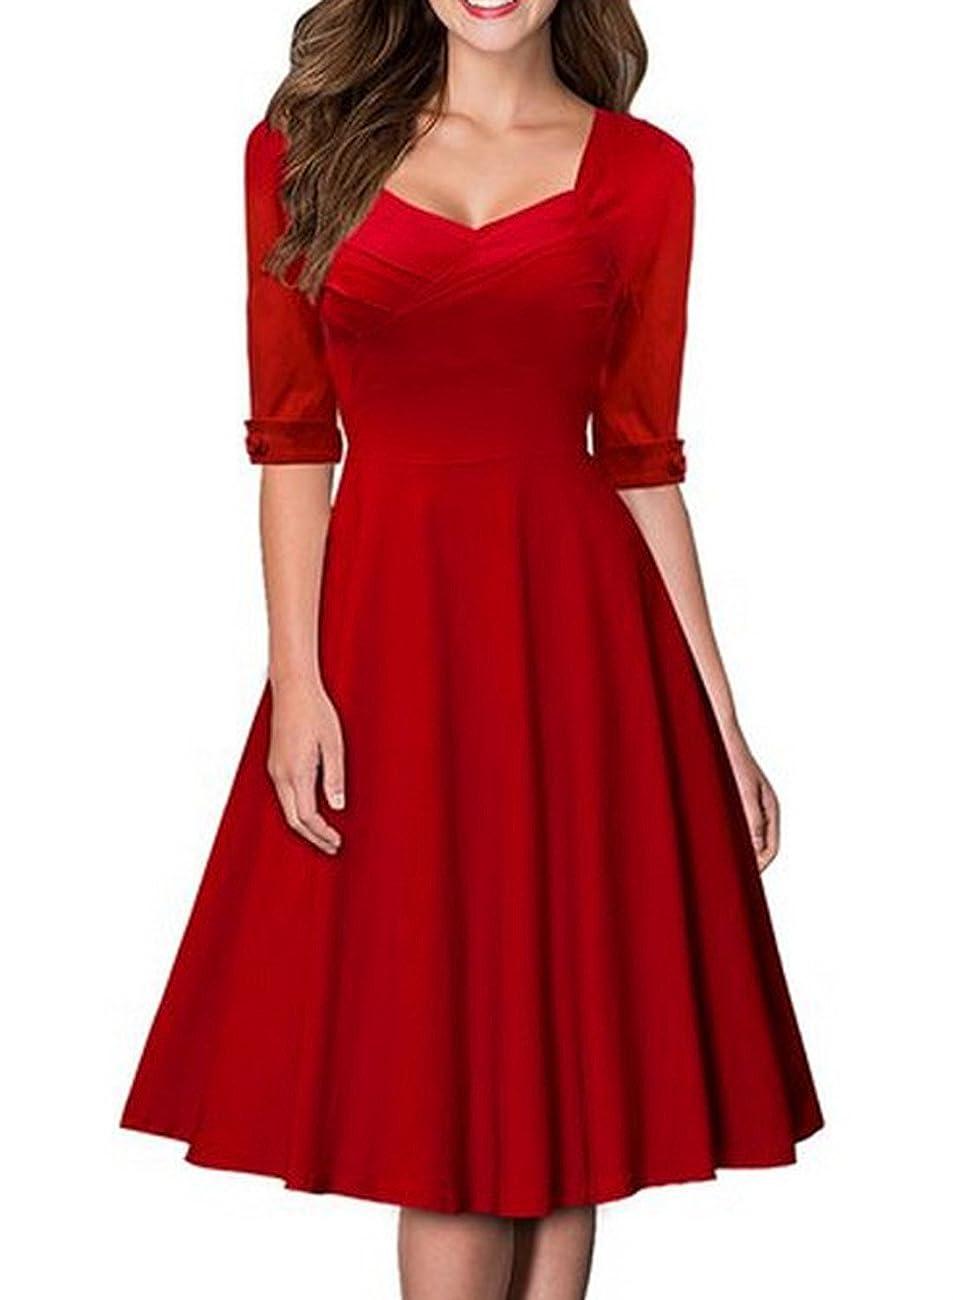 SYLVIEY Women's Hepburn Style Short Sleeve Vintage Bridesmaid Party Dress 0